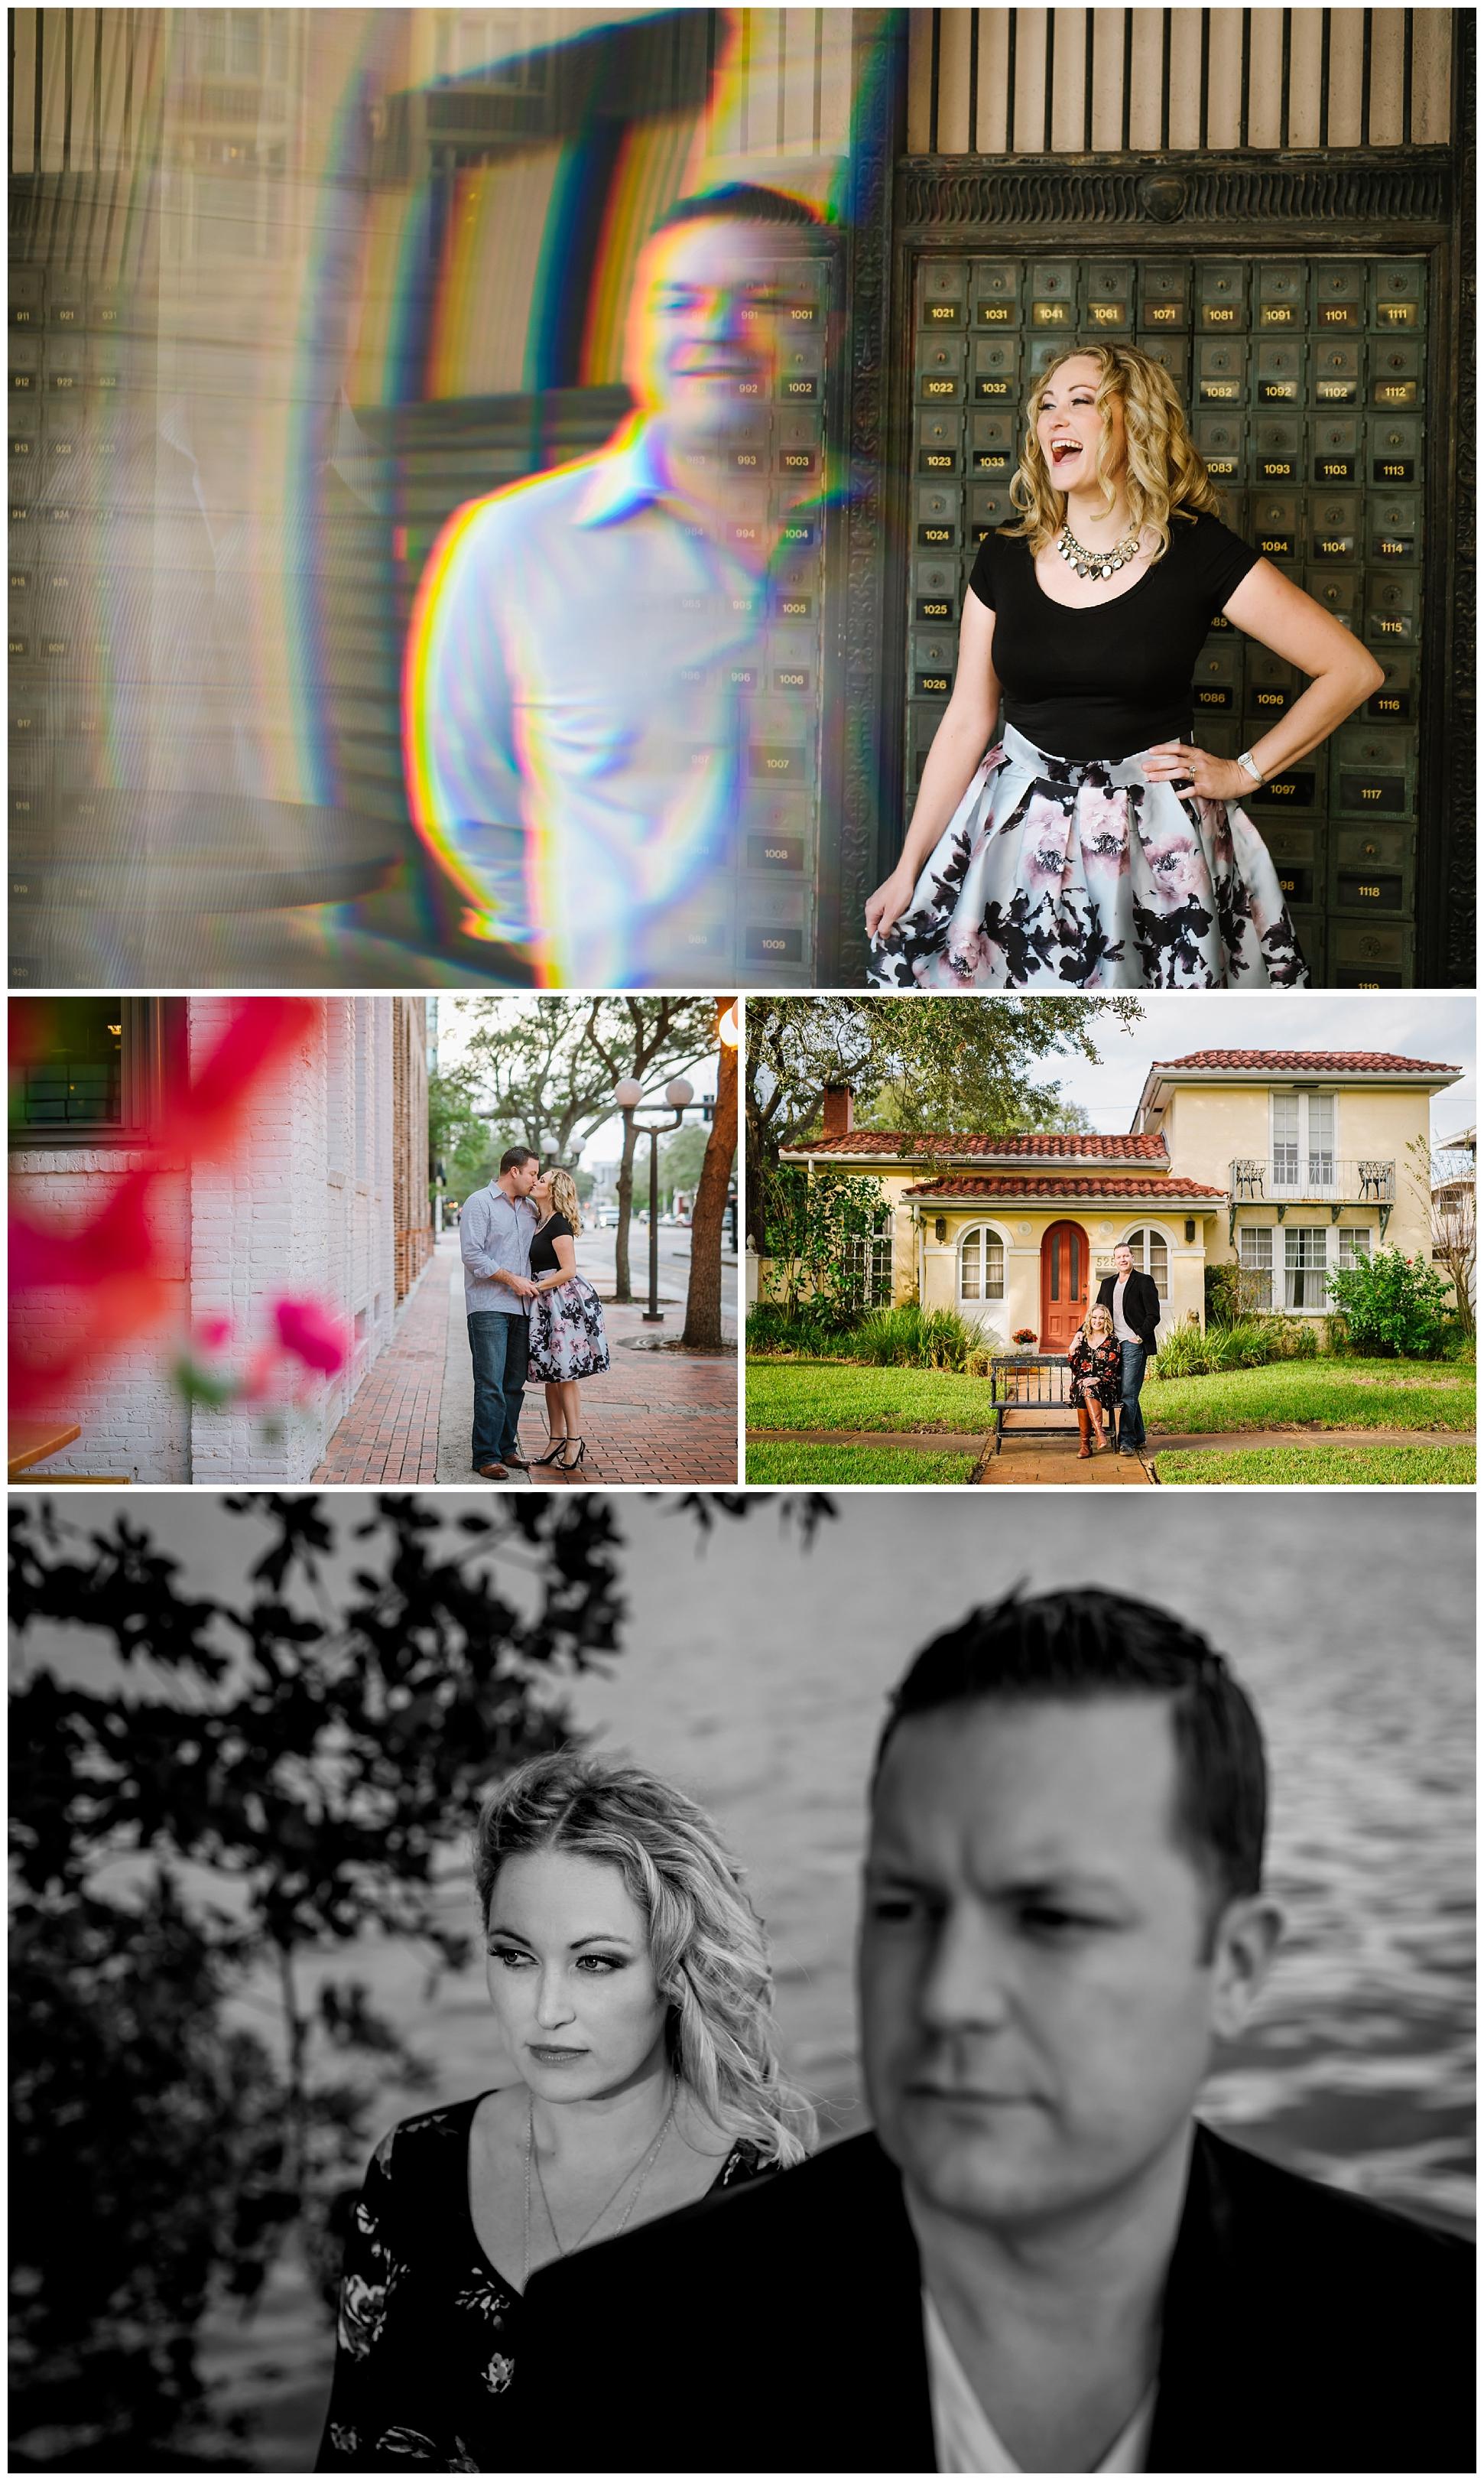 Ashlee-hamon-photography-year-in-review-2016-travel-wanderlust-vsco-adventure-wedding_0021.jpg